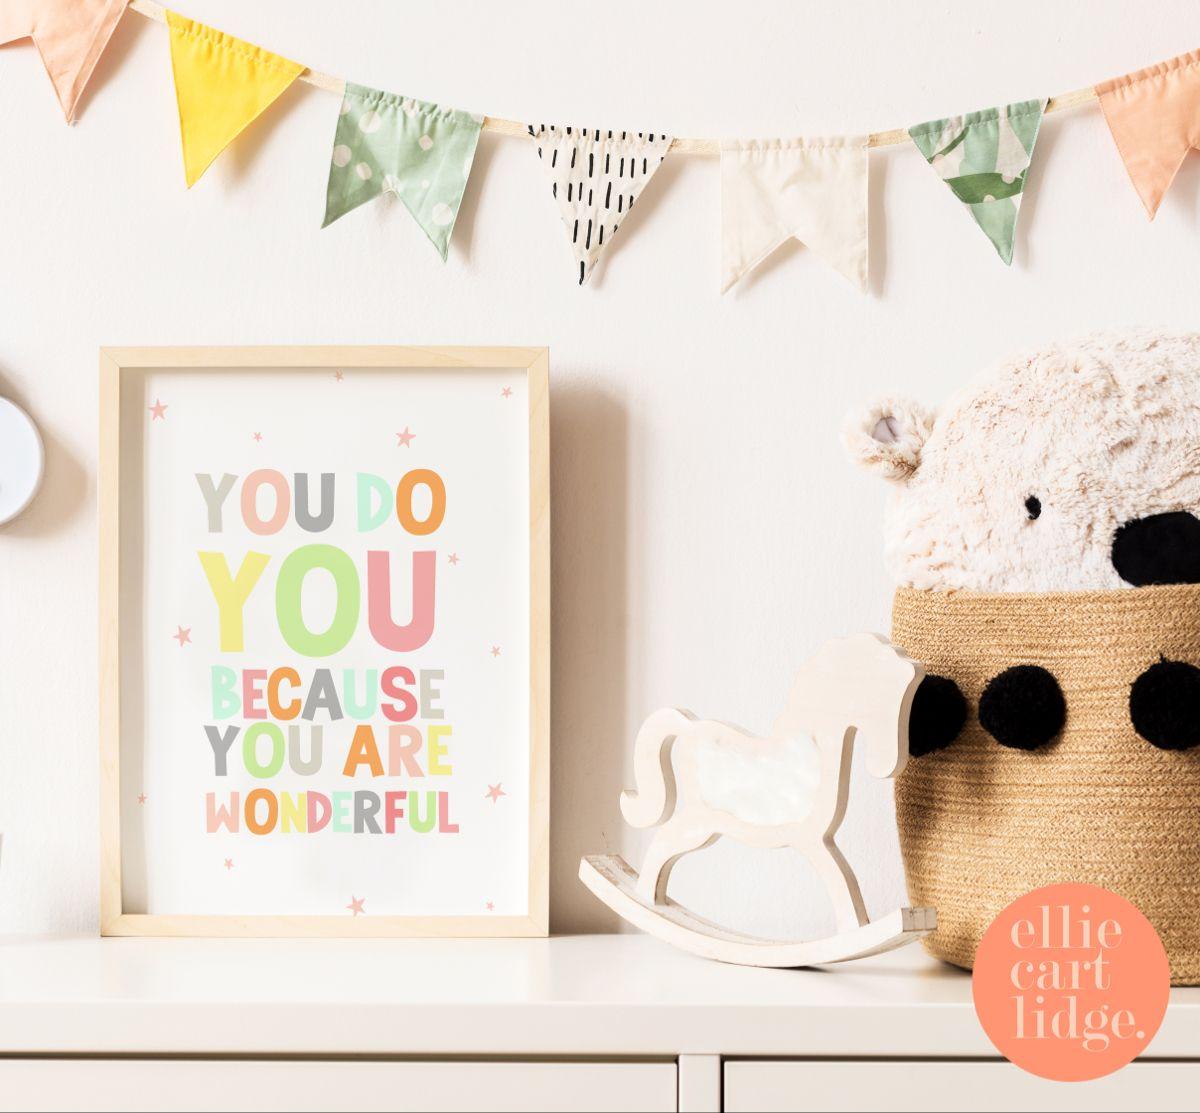 #quotes #quoteprints #positivequote #beyourselfquotes #prints #printsforsale #kidsprints #pastelart #girlsroomdecor #girlsnursery #nurseryart #nurseryprints #nurserydecor #toddlerroom #childrensroomdecor #childrensprints #type #colourfulart #girlsroomideas #beyou #youdoyou #encouragementquotes